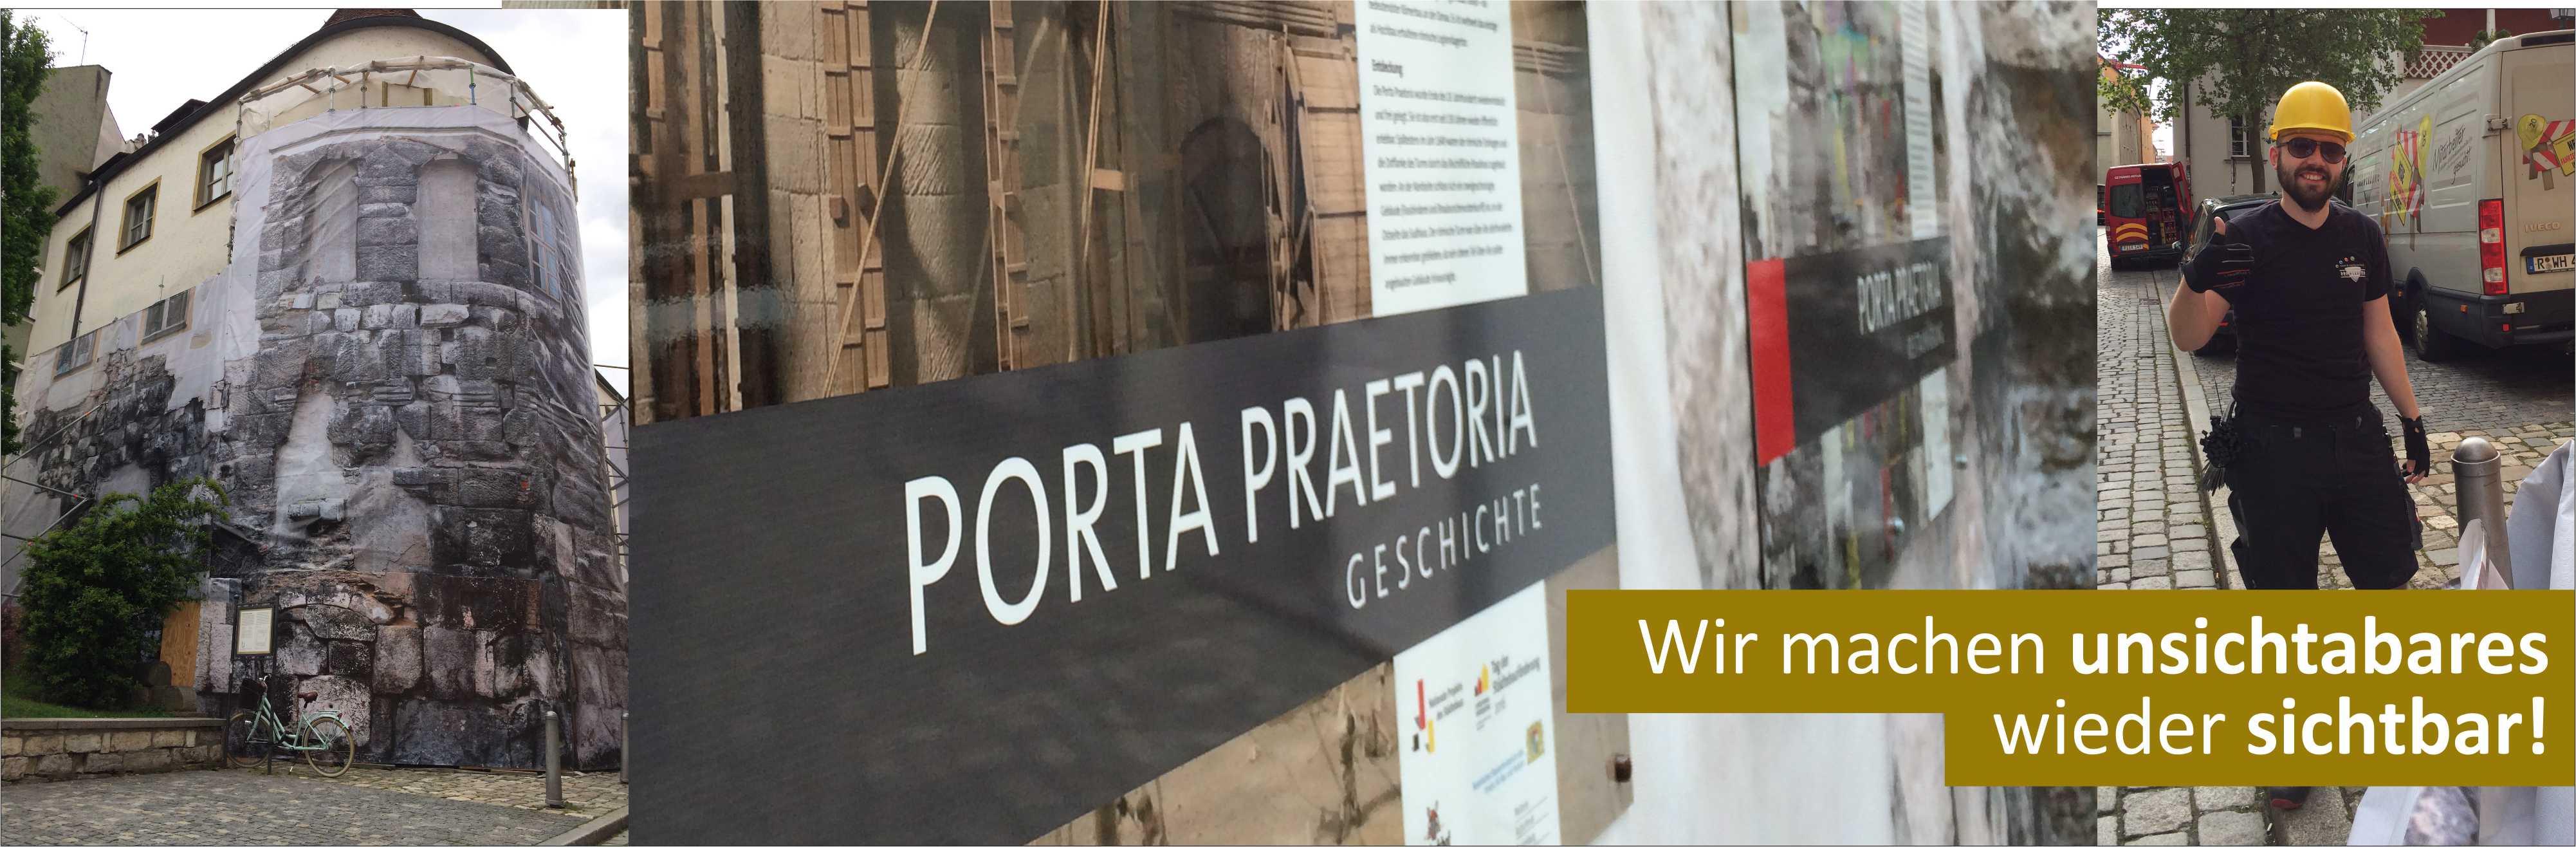 S&S Werbung, Regensburg: Porta Praetoria